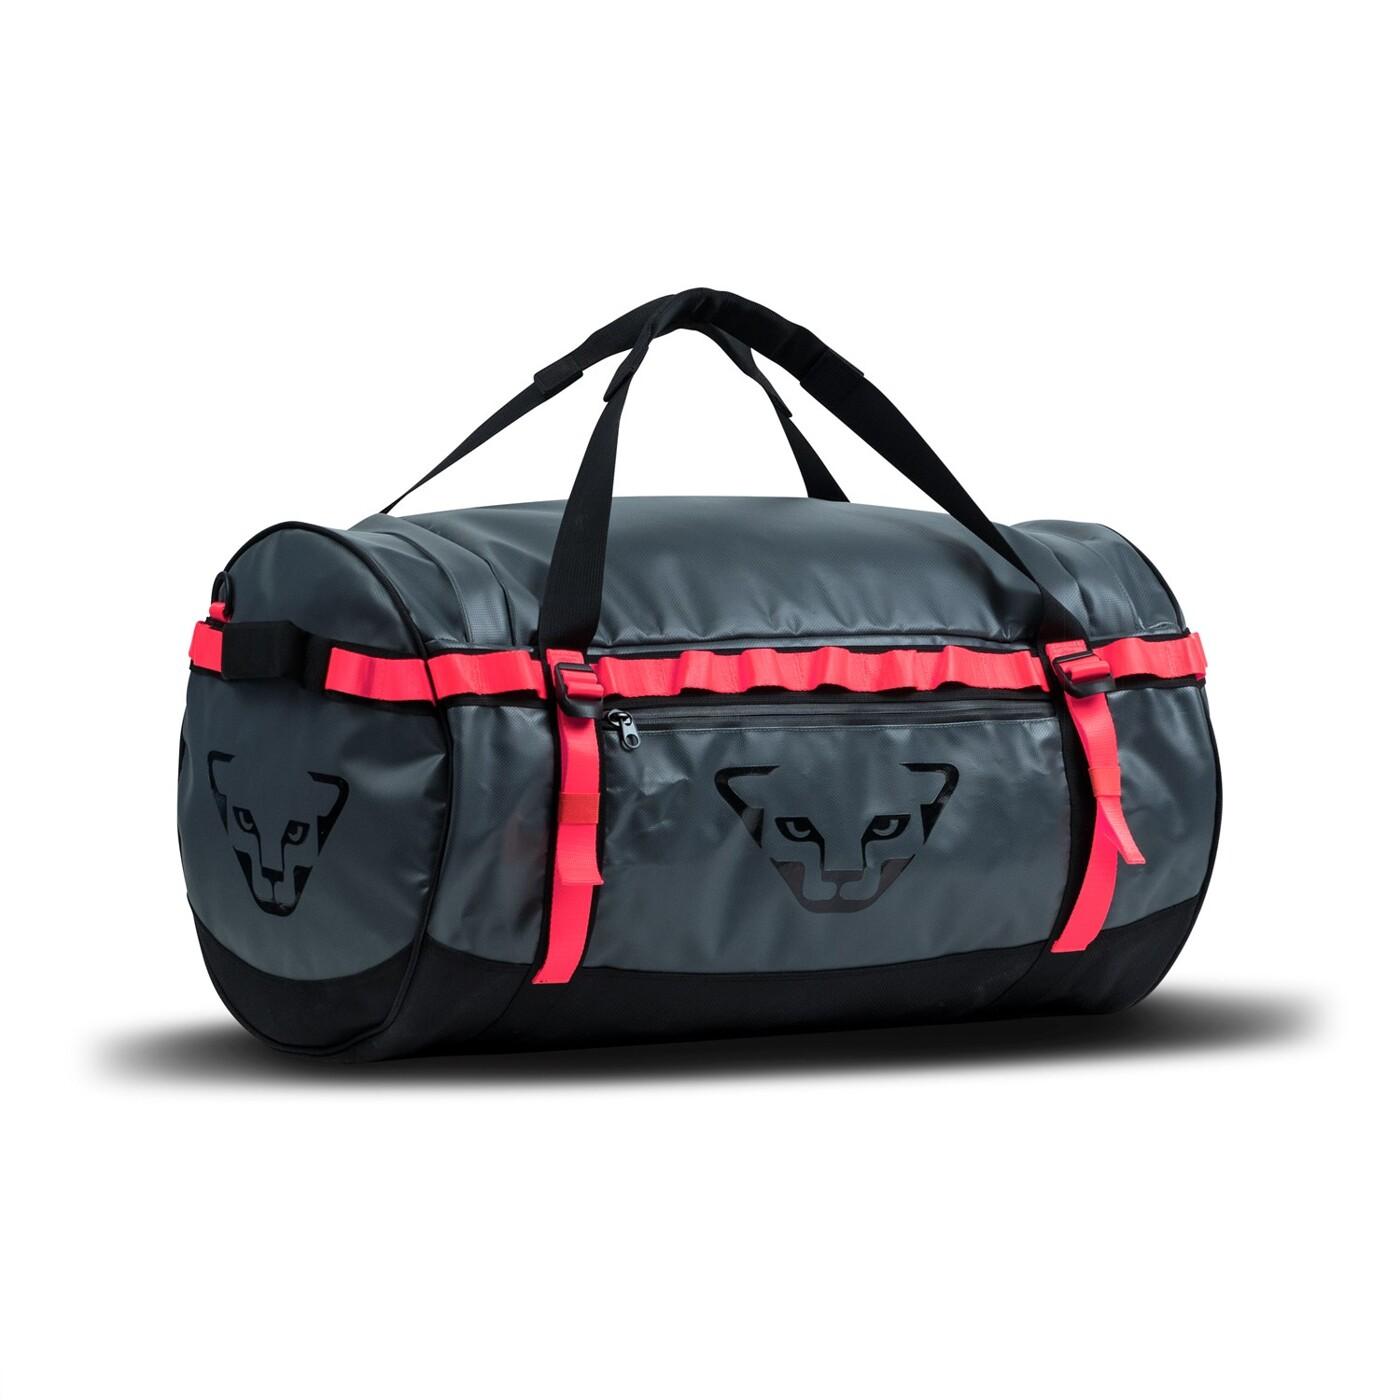 DYNAFIT Duffle Bag 60L